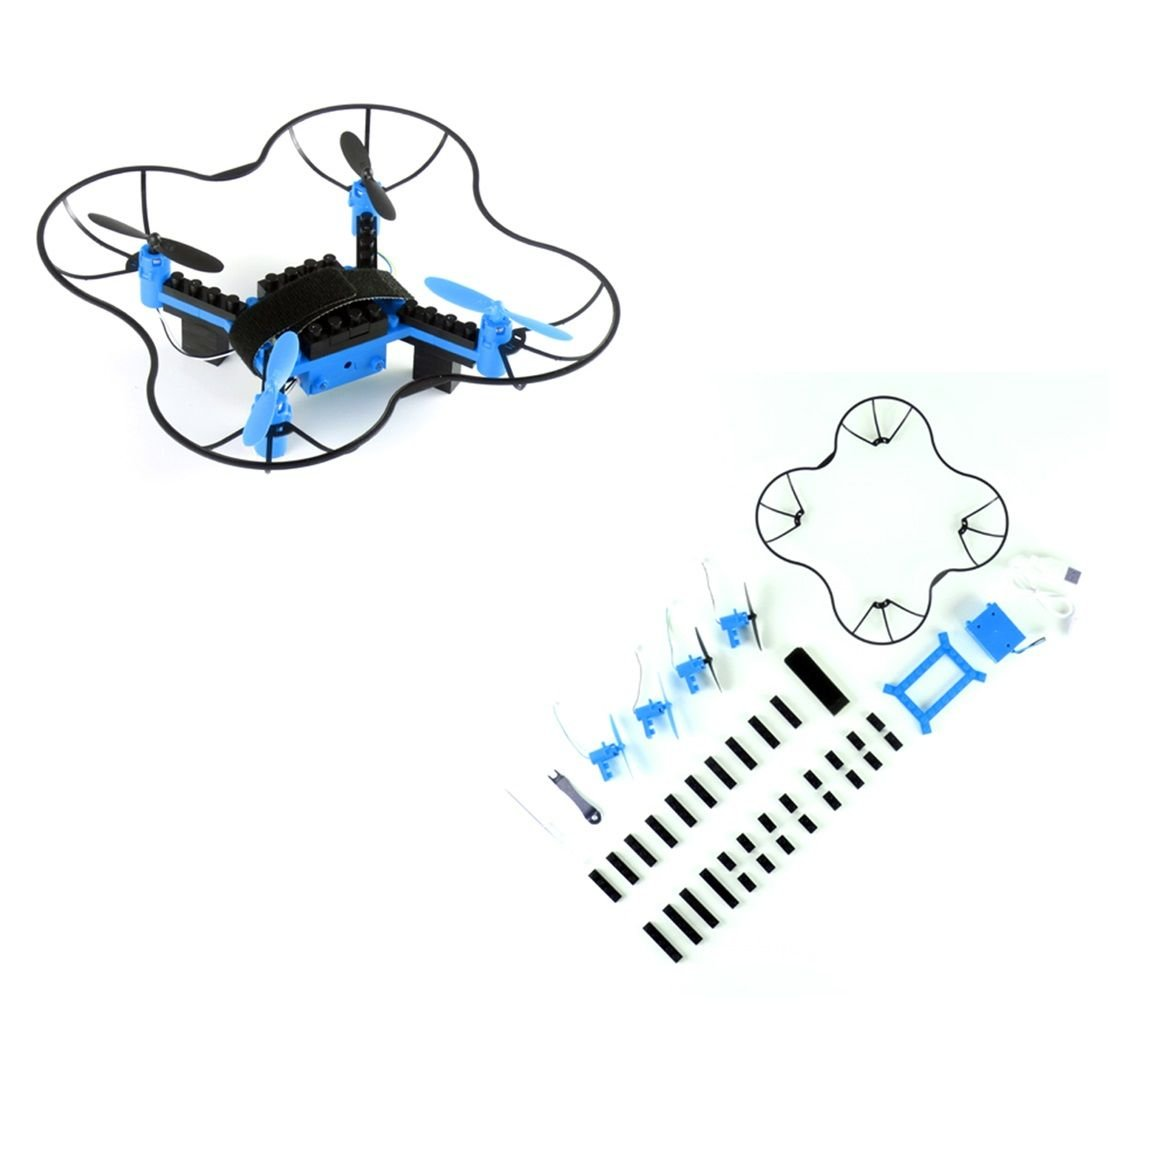 ODYSSEY Toys Build-A-Drone